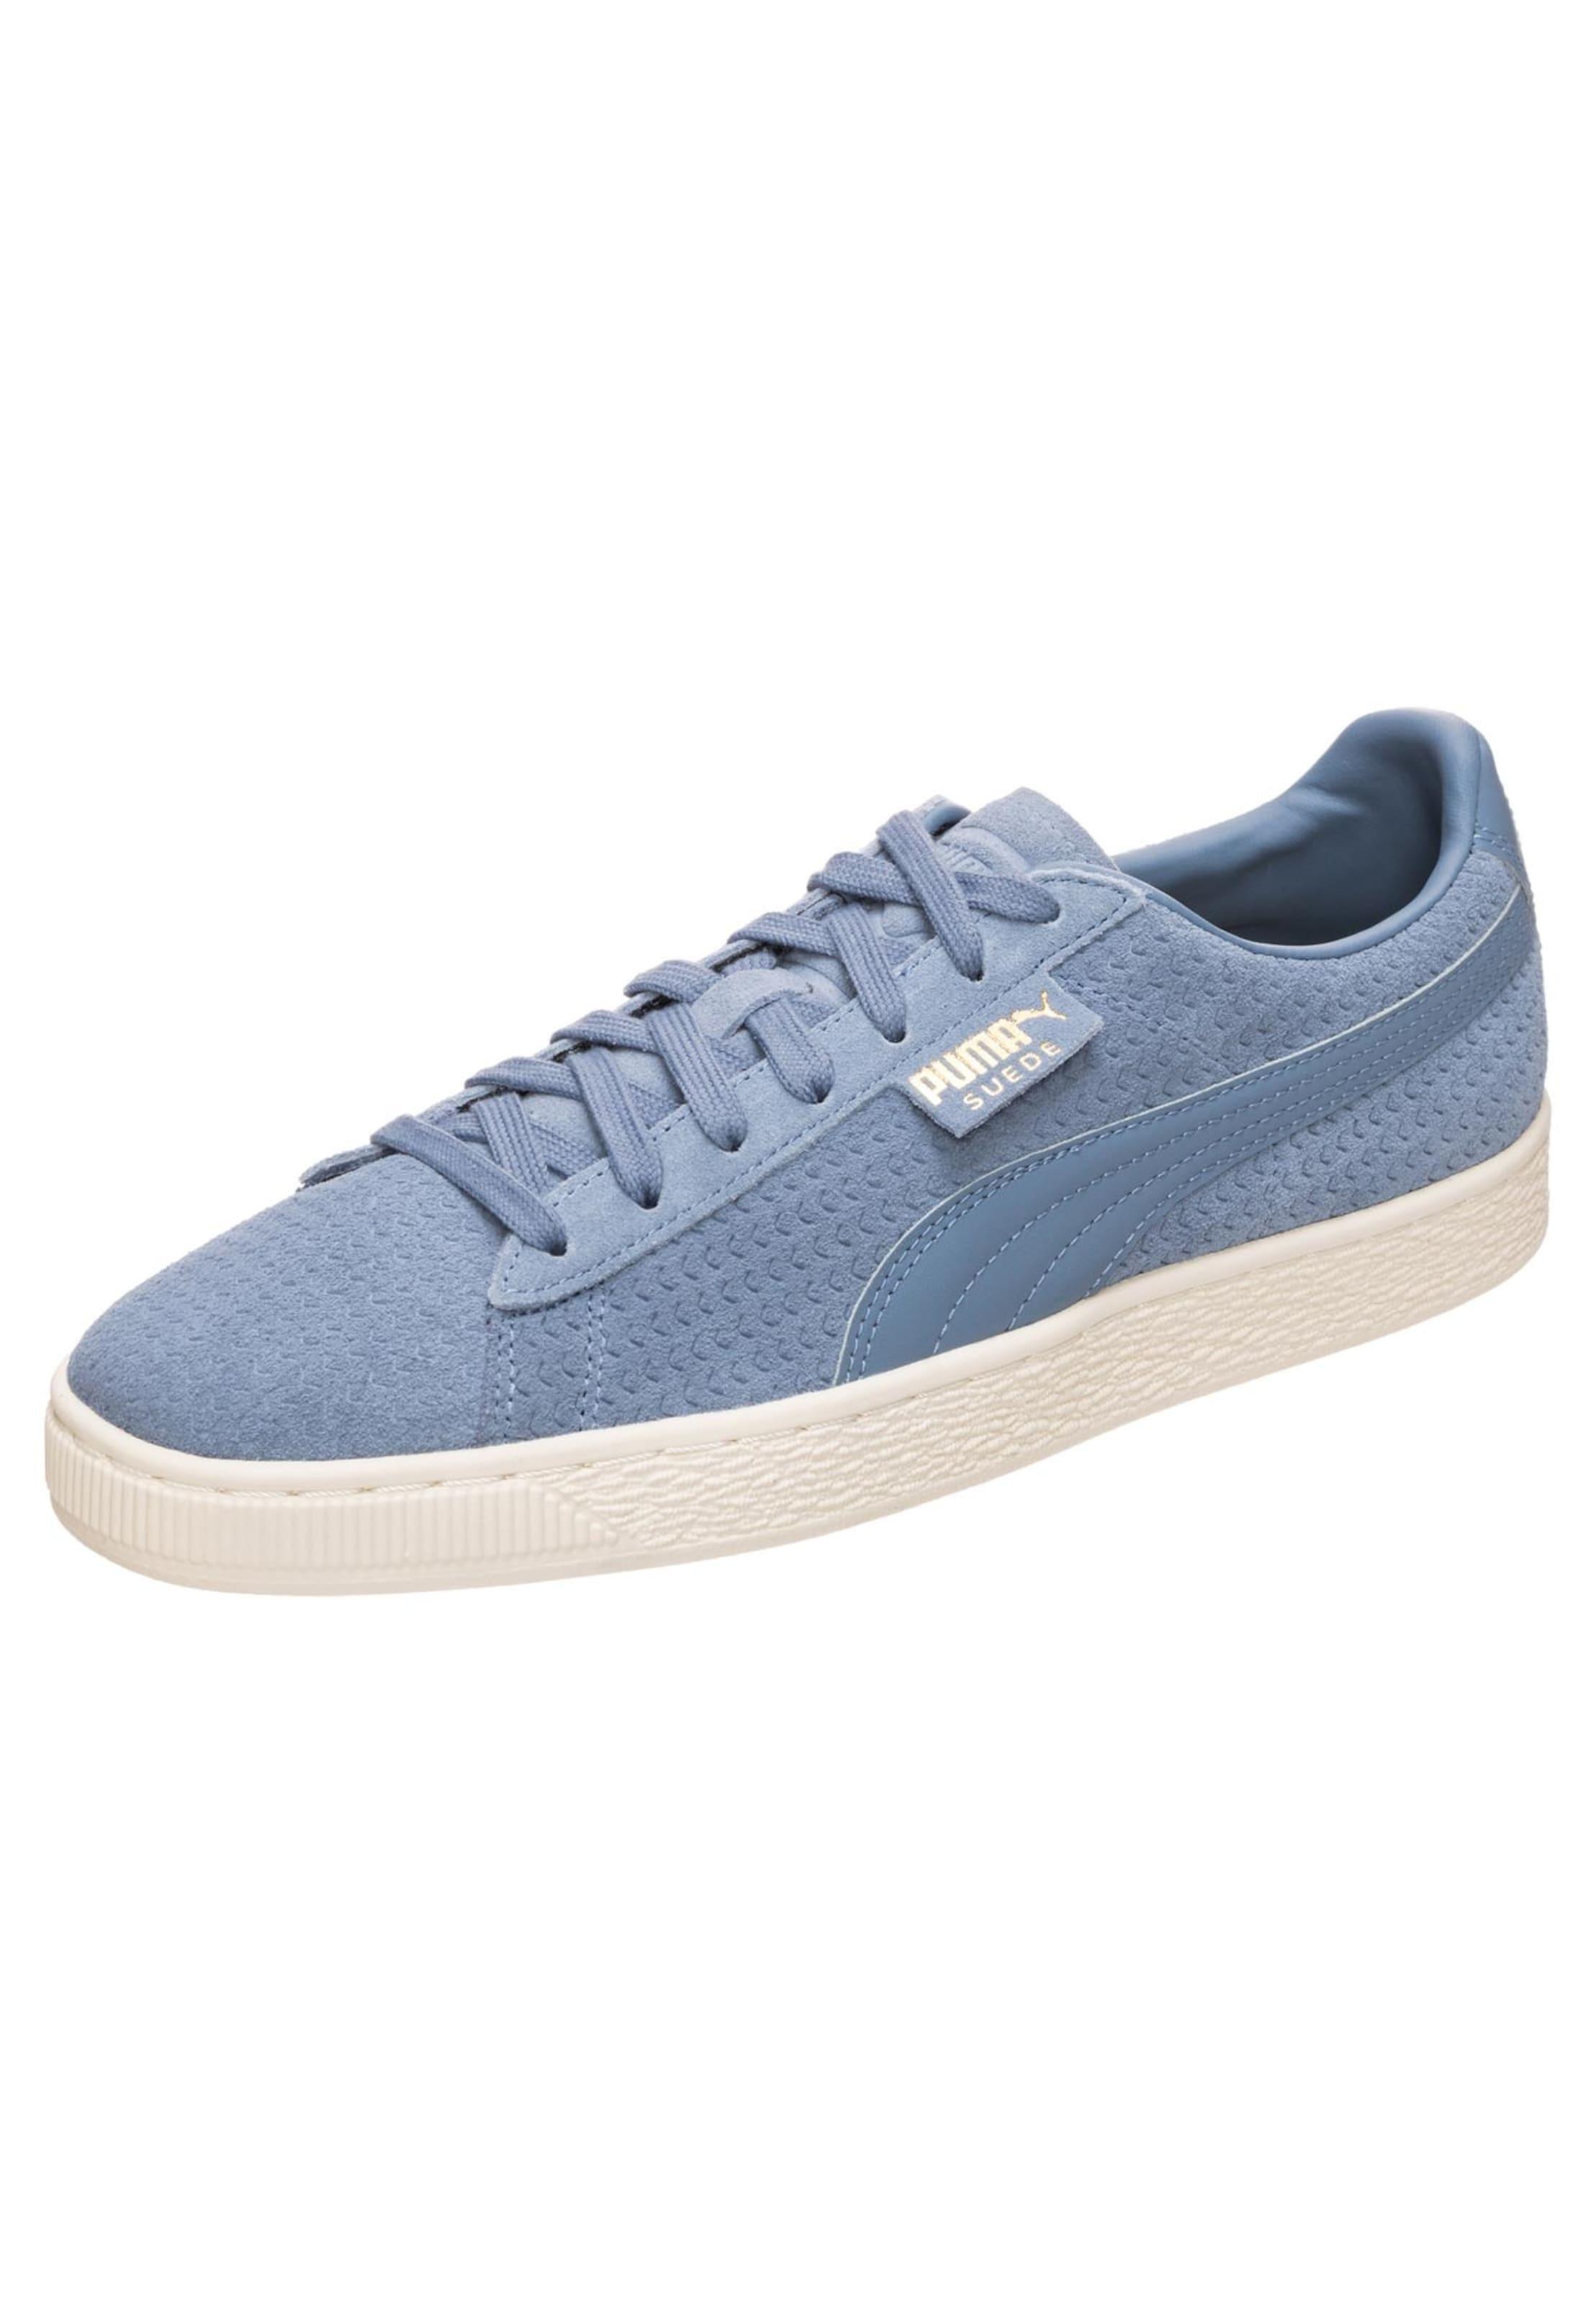 PUMA Sneaker Suede Classic Perforation Hohe Qualität